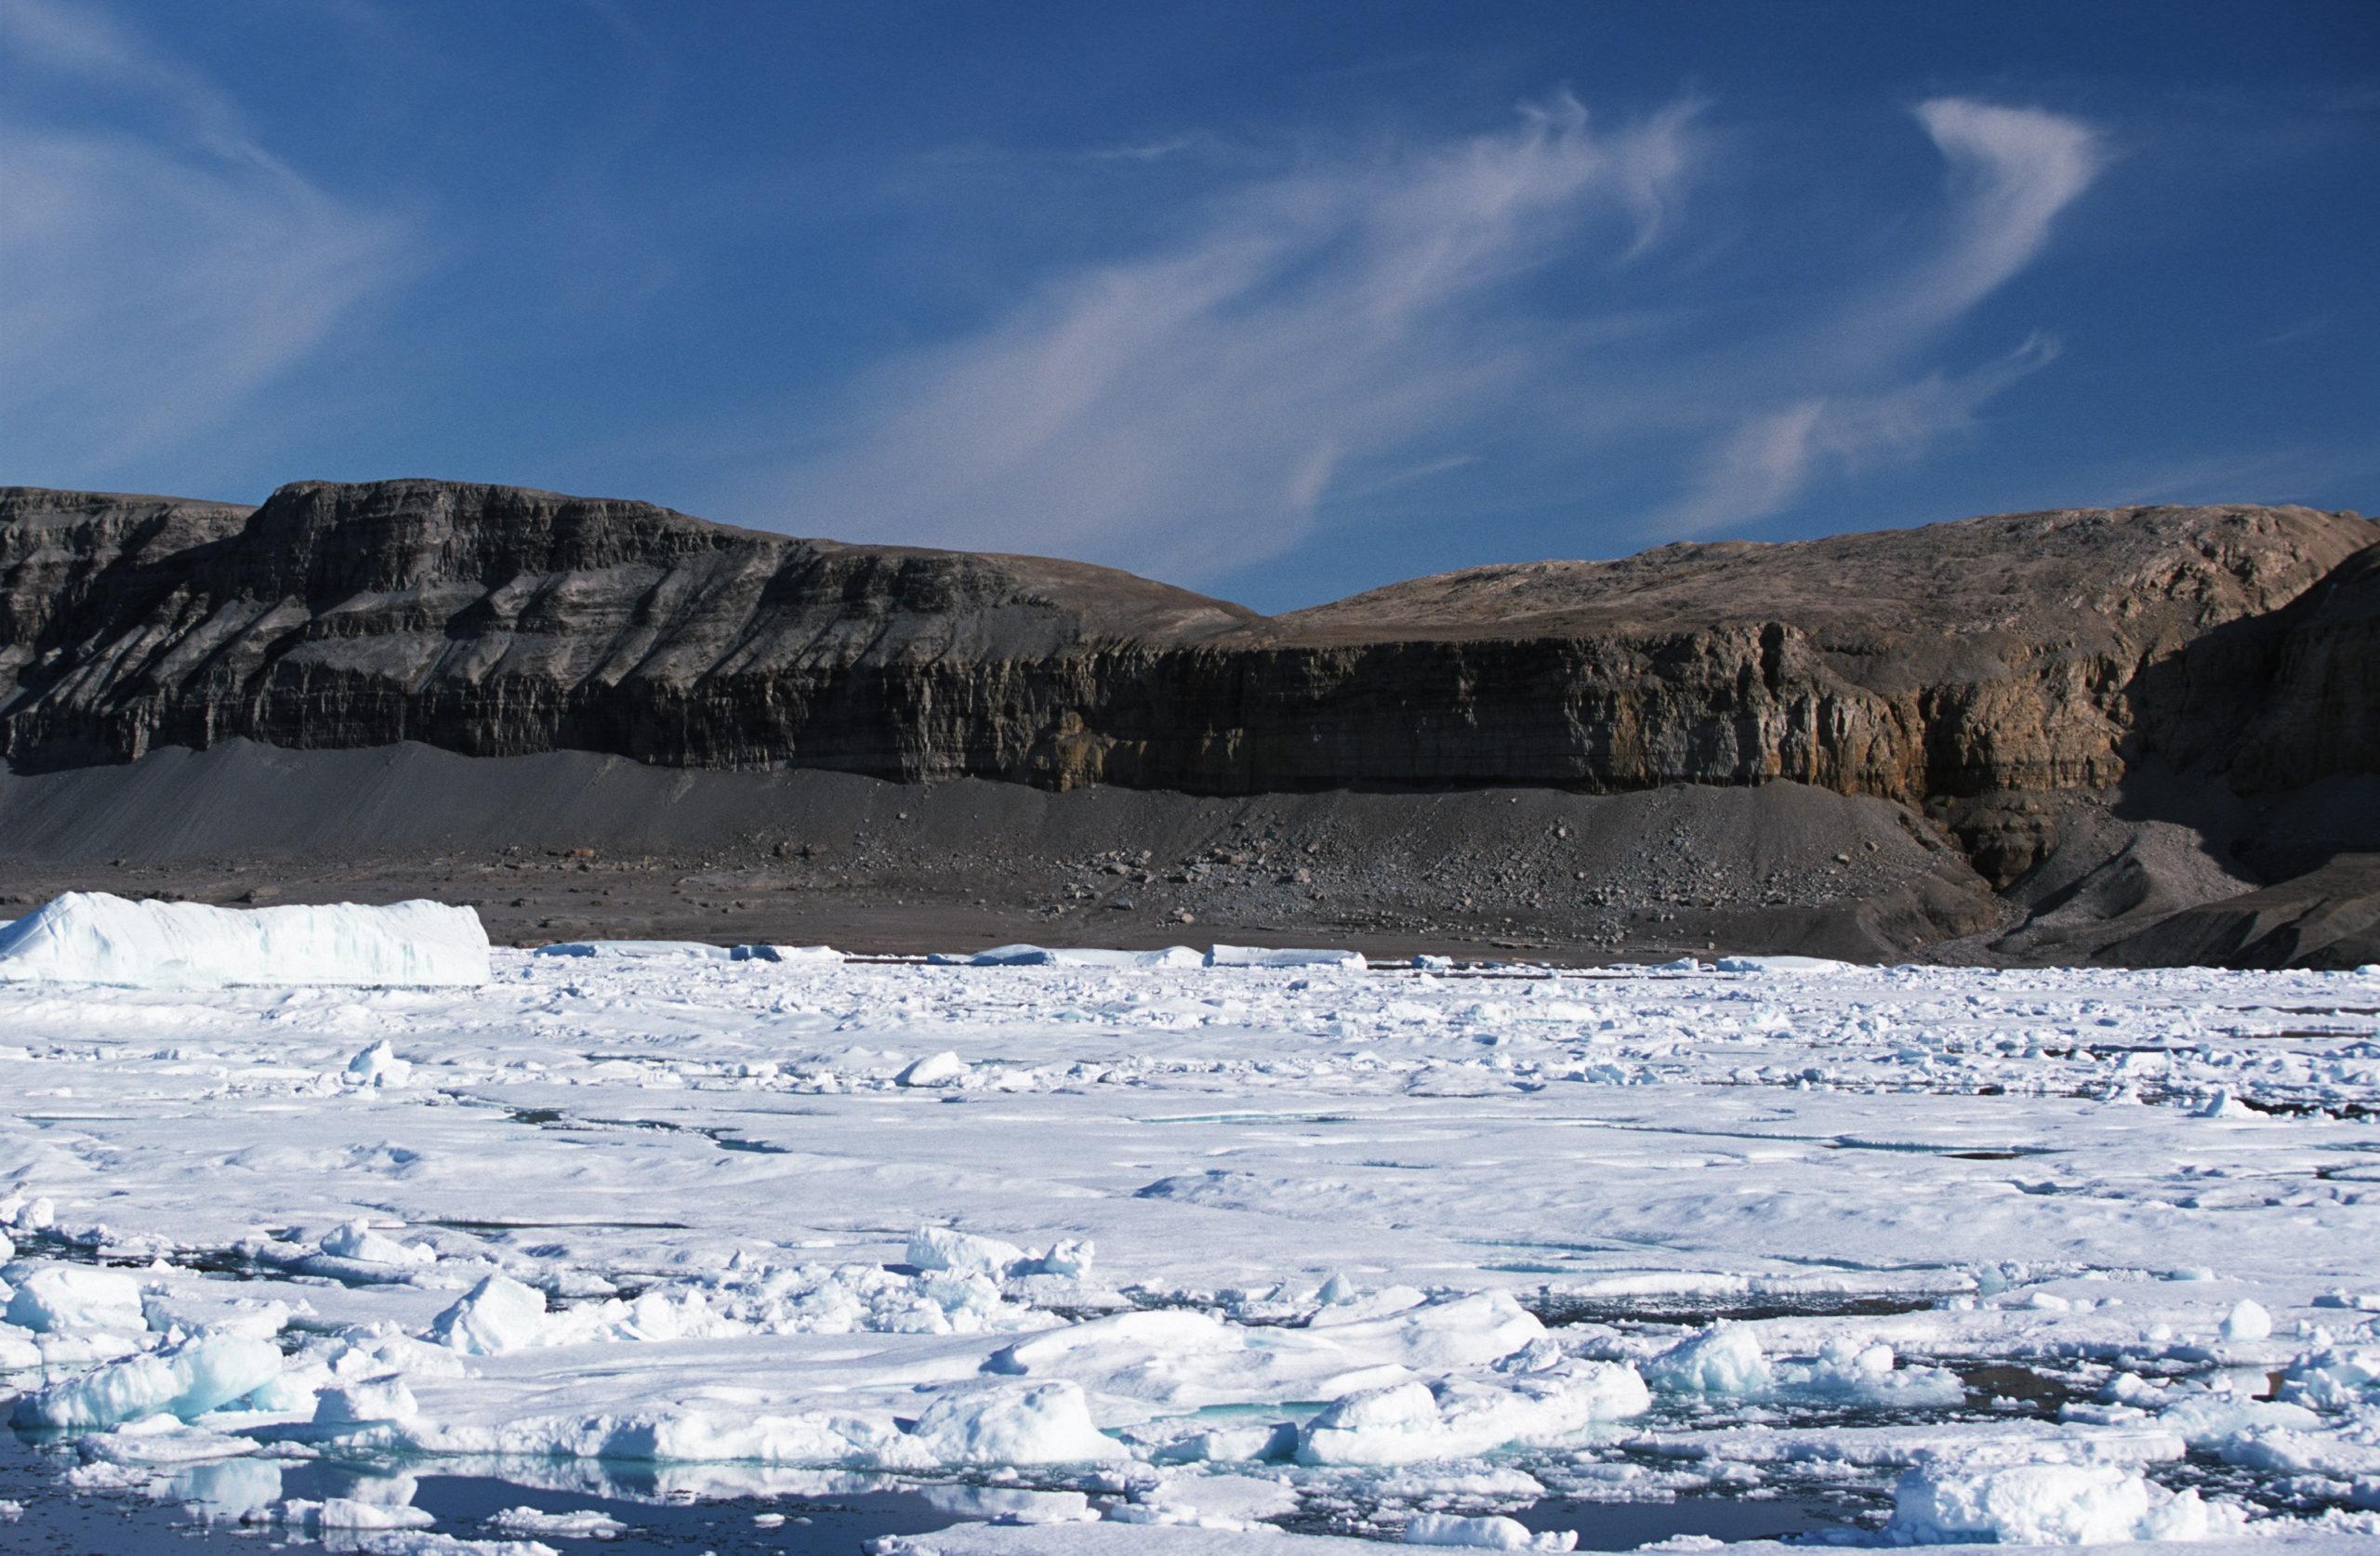 Sea ice on the coast of northeast Ellesmere Island, Nunavut, Canada.